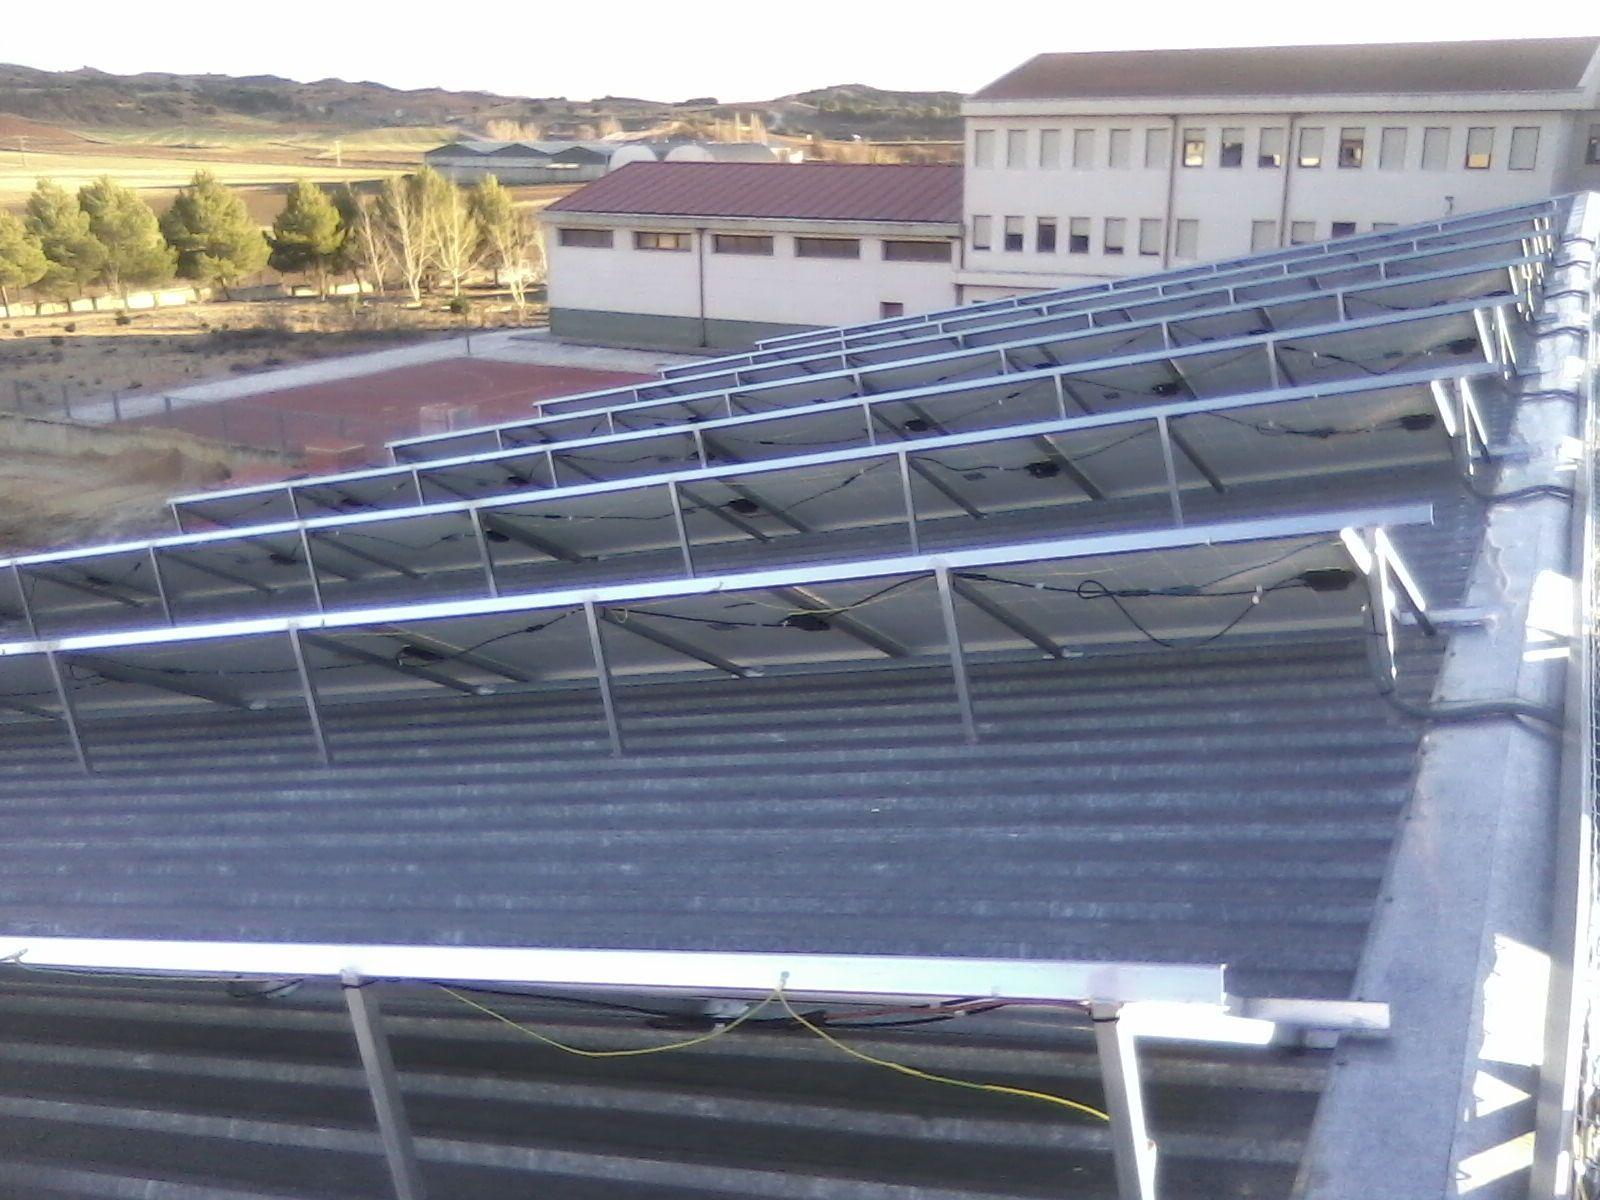 Dakota electrocuenca renovables for Instalacion fotovoltaica conectada a red